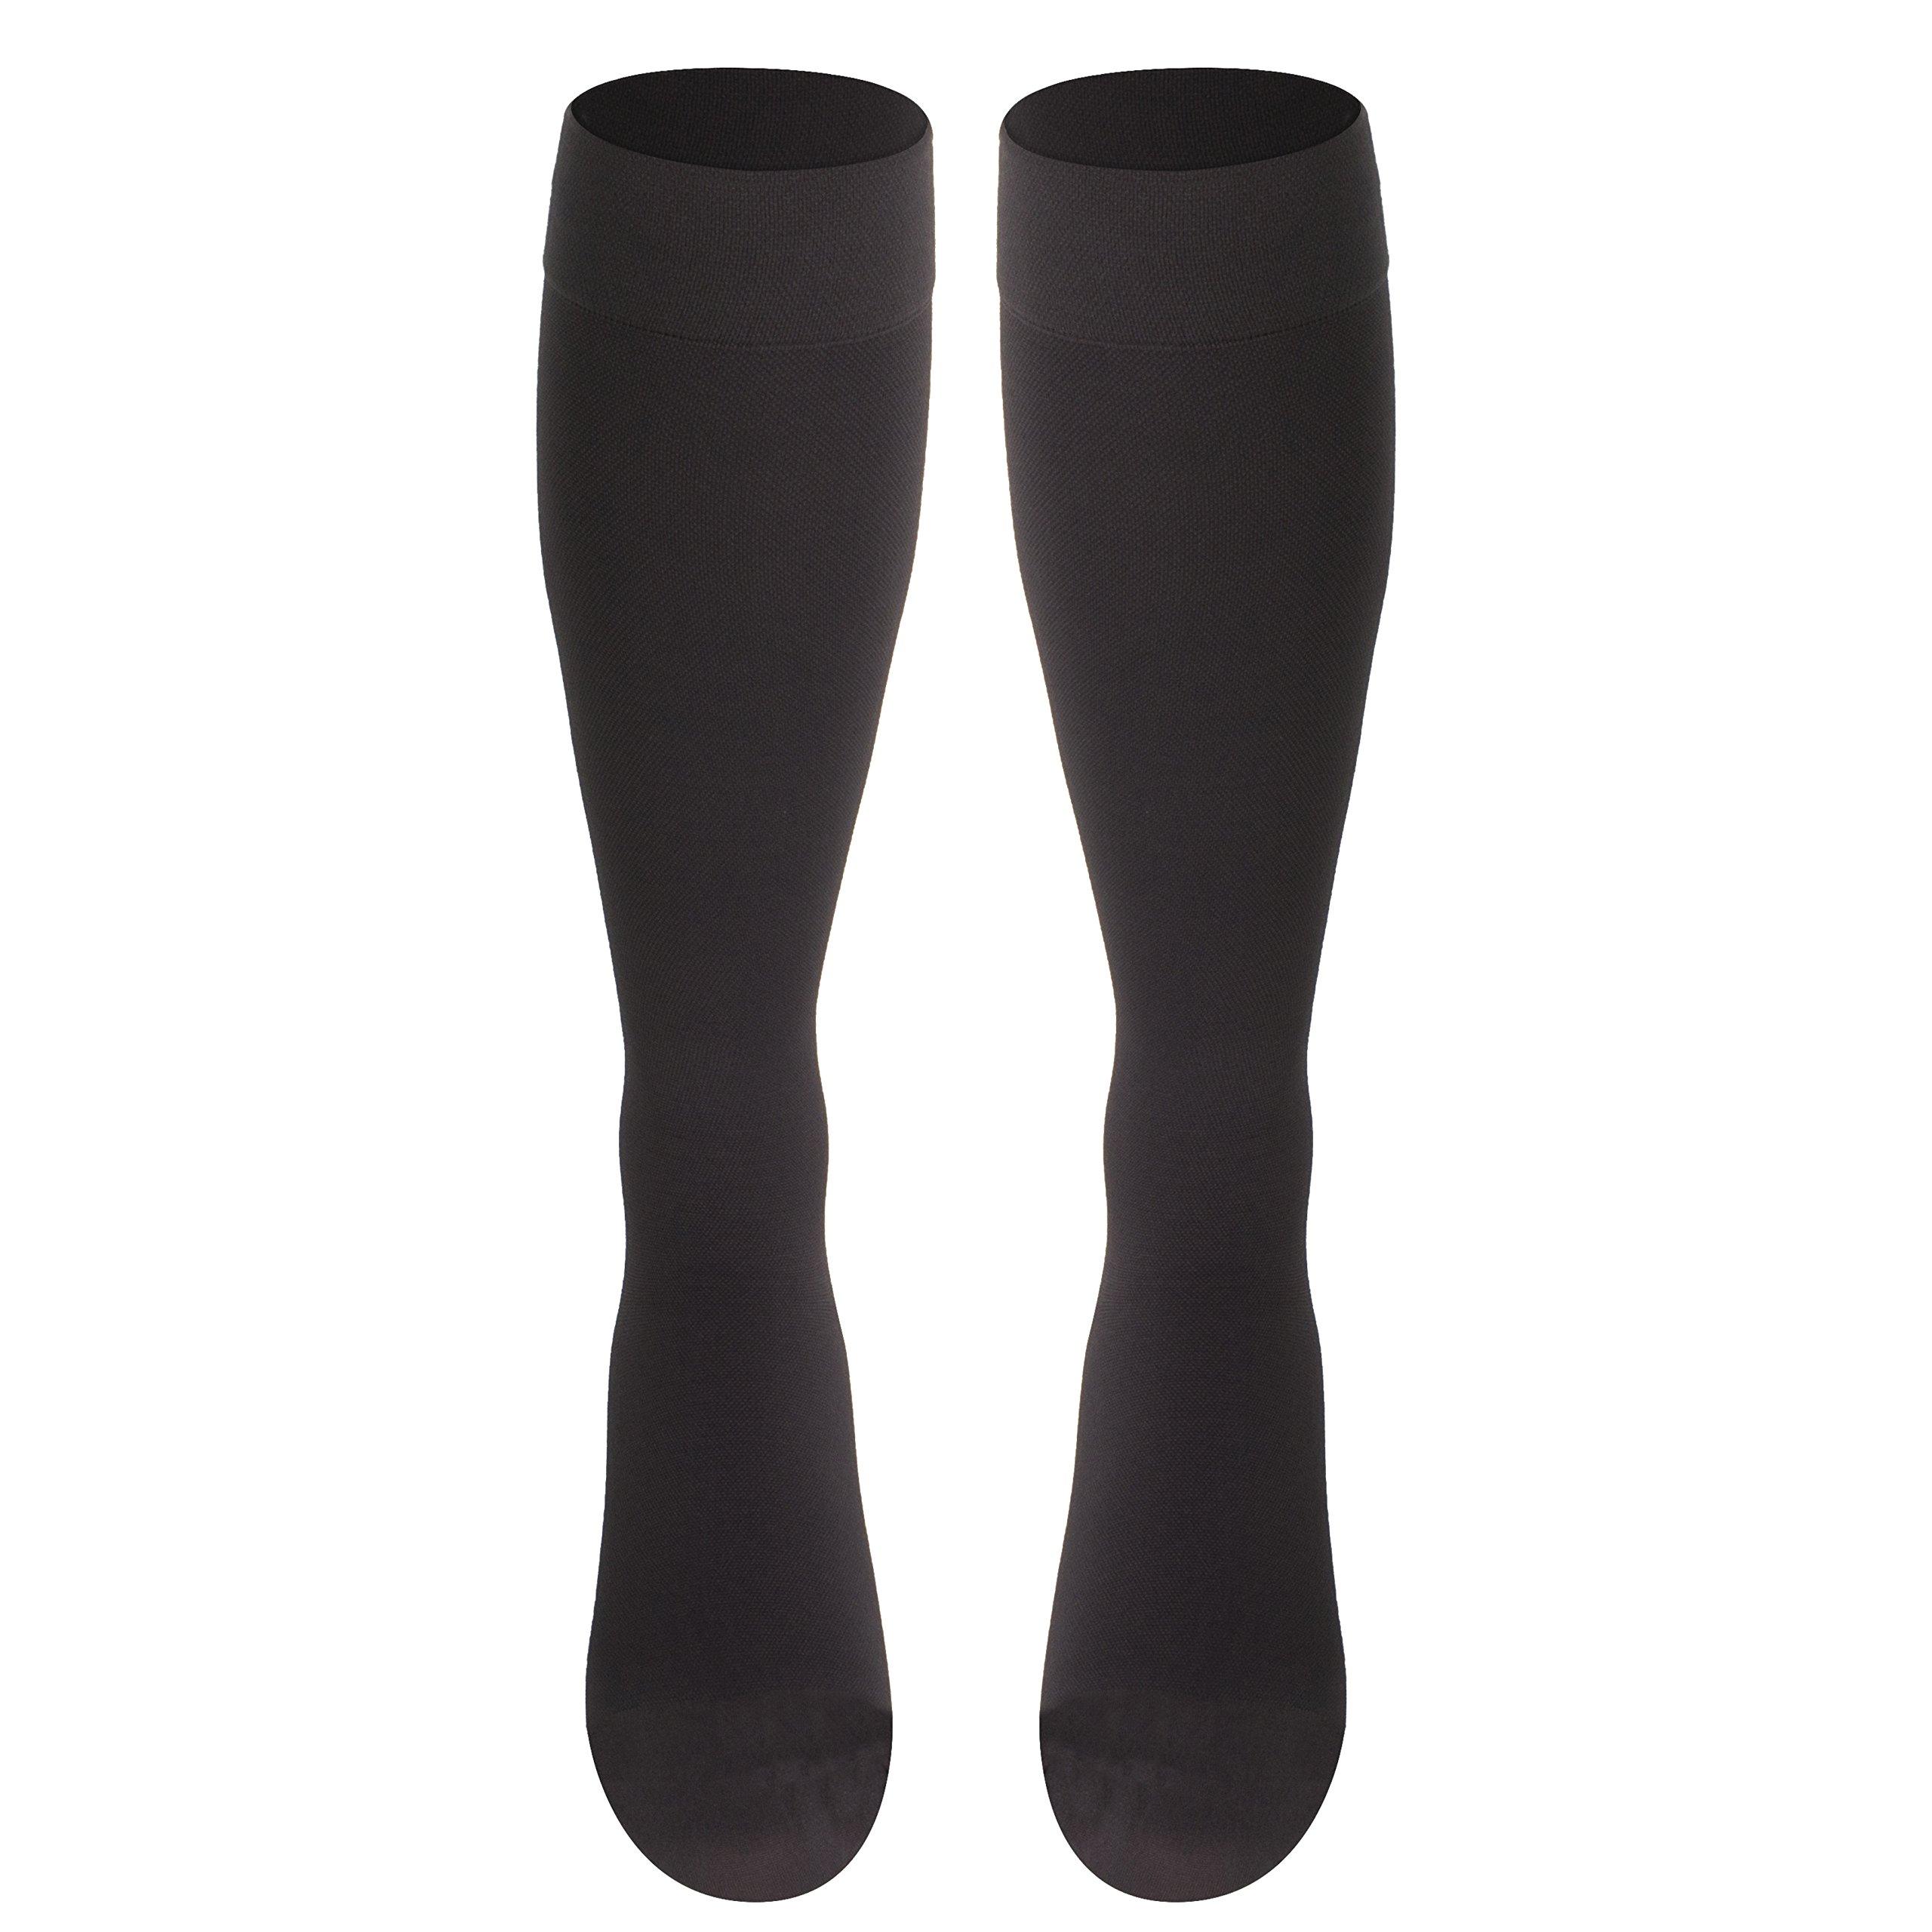 Truform Compression Stockings, 20-30 mmHg, Knee High, Charcoal, Medium